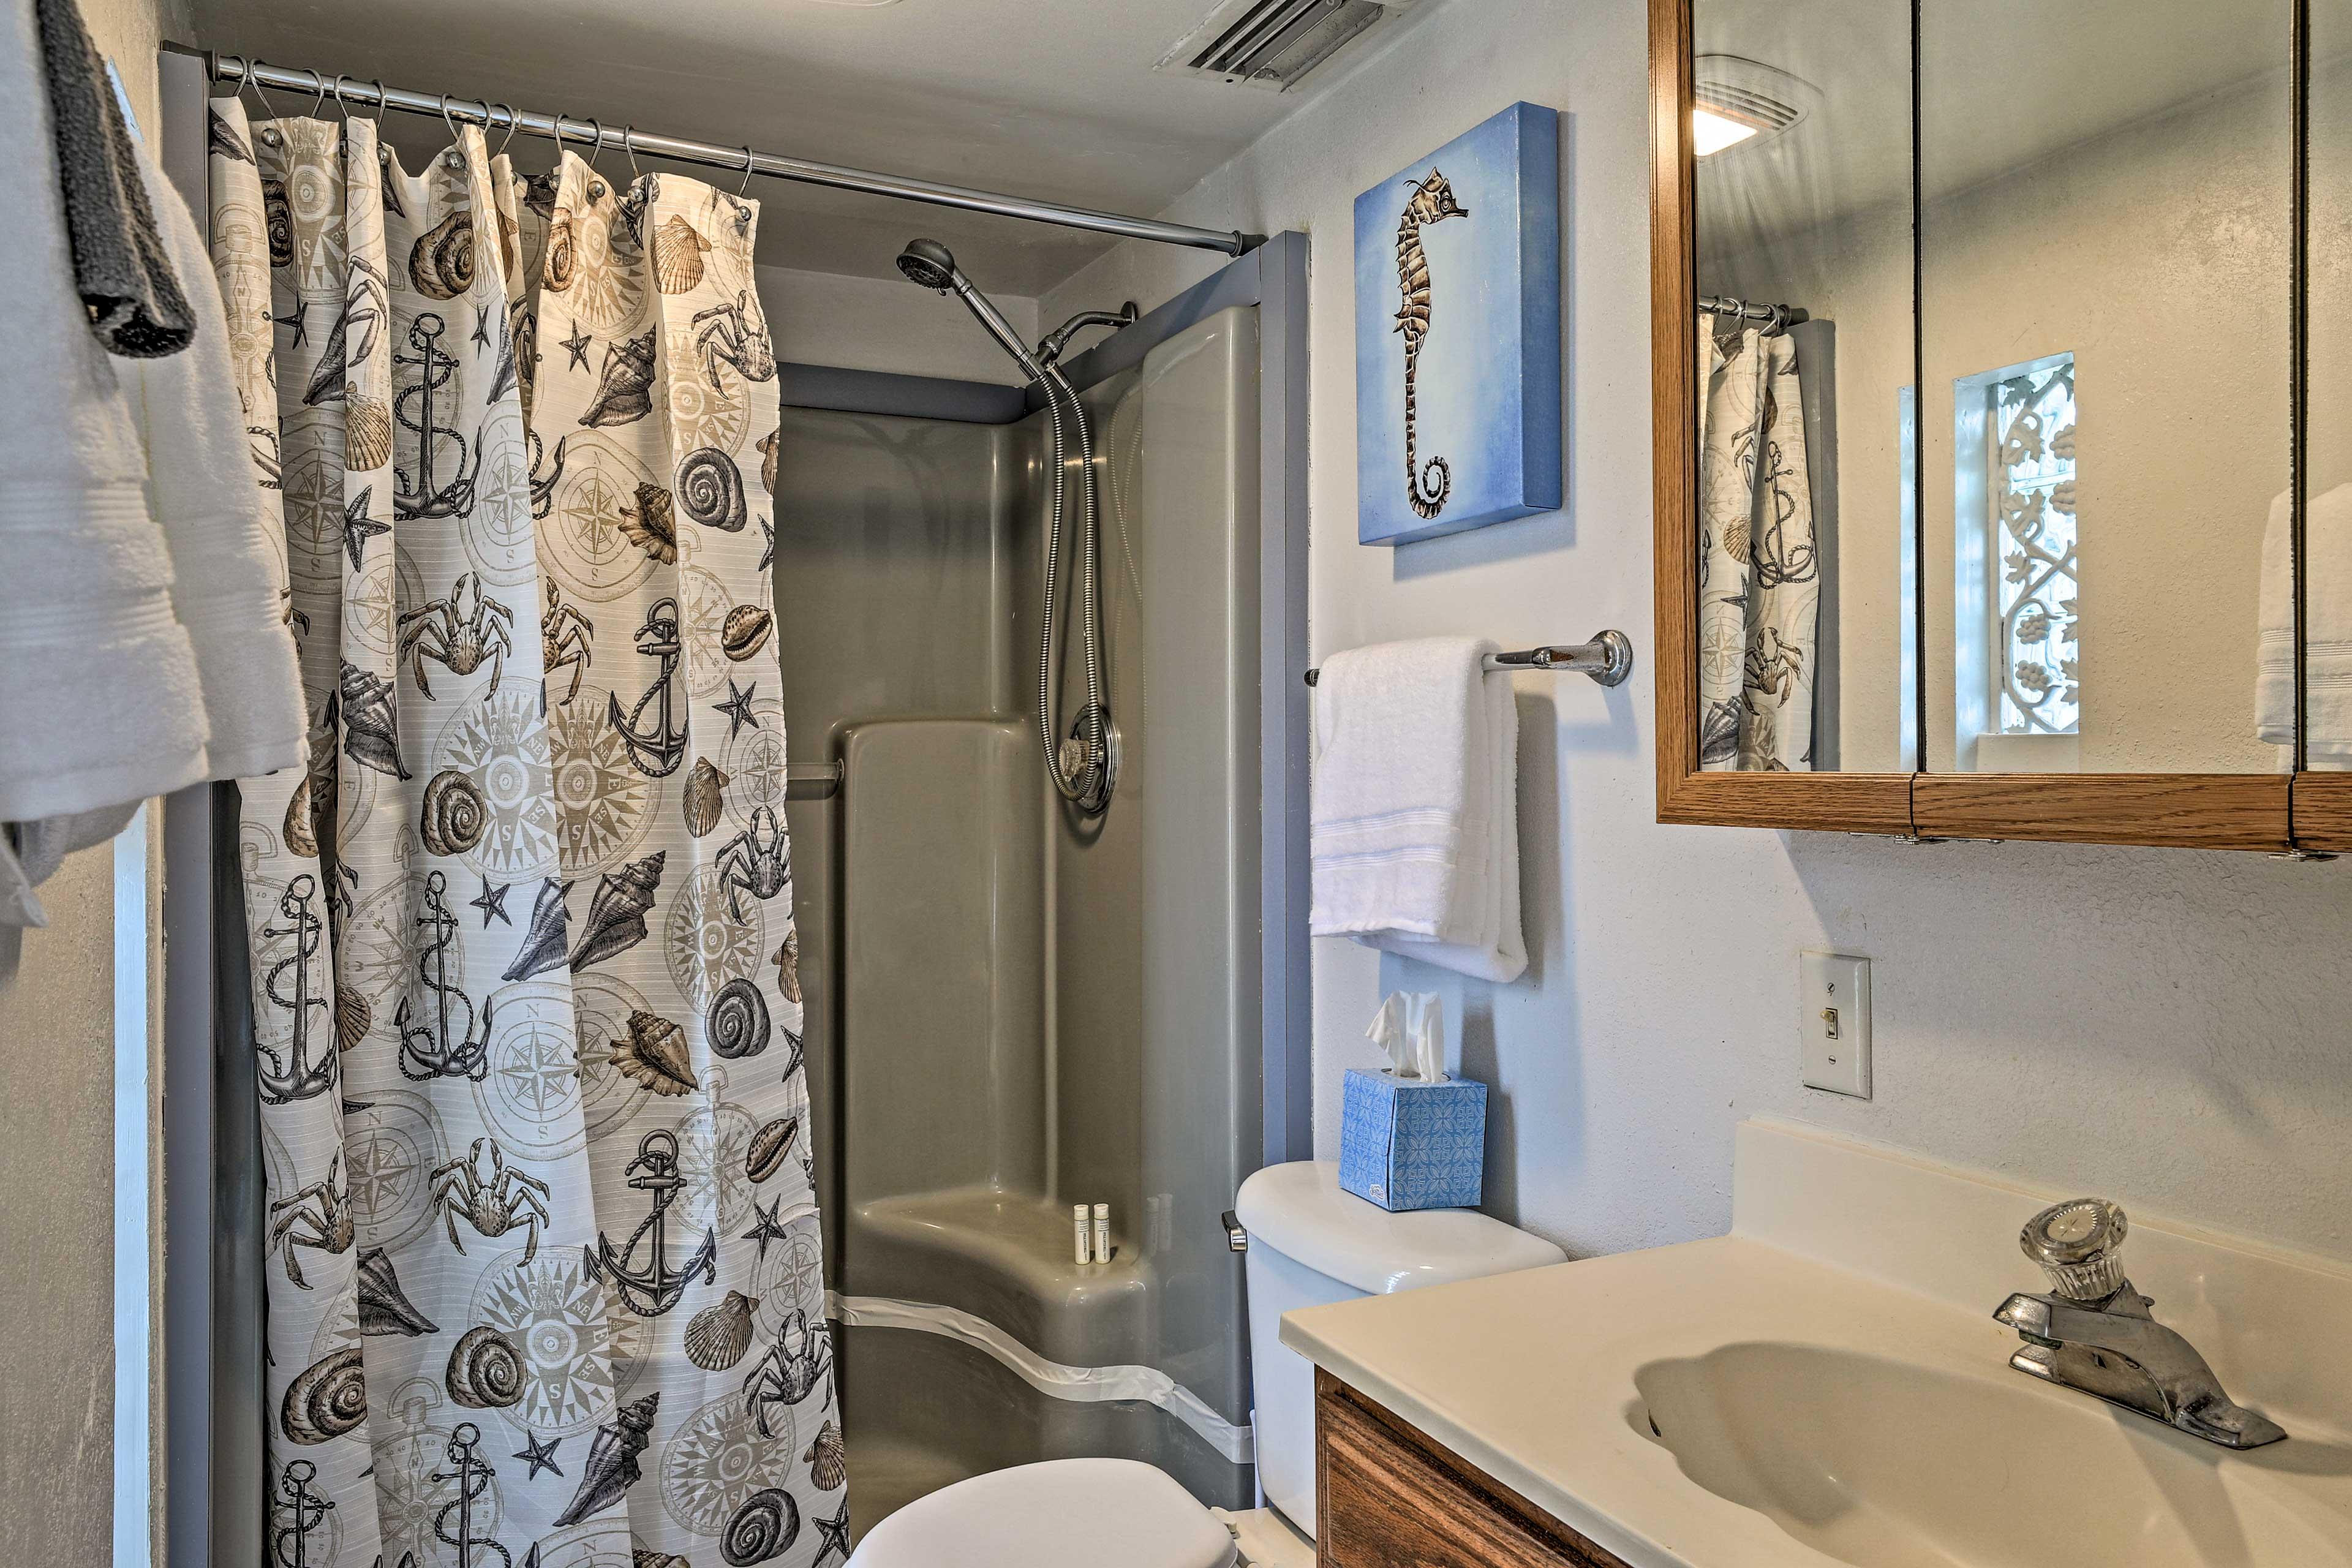 Continue to admire nautical decor in the bathroom.